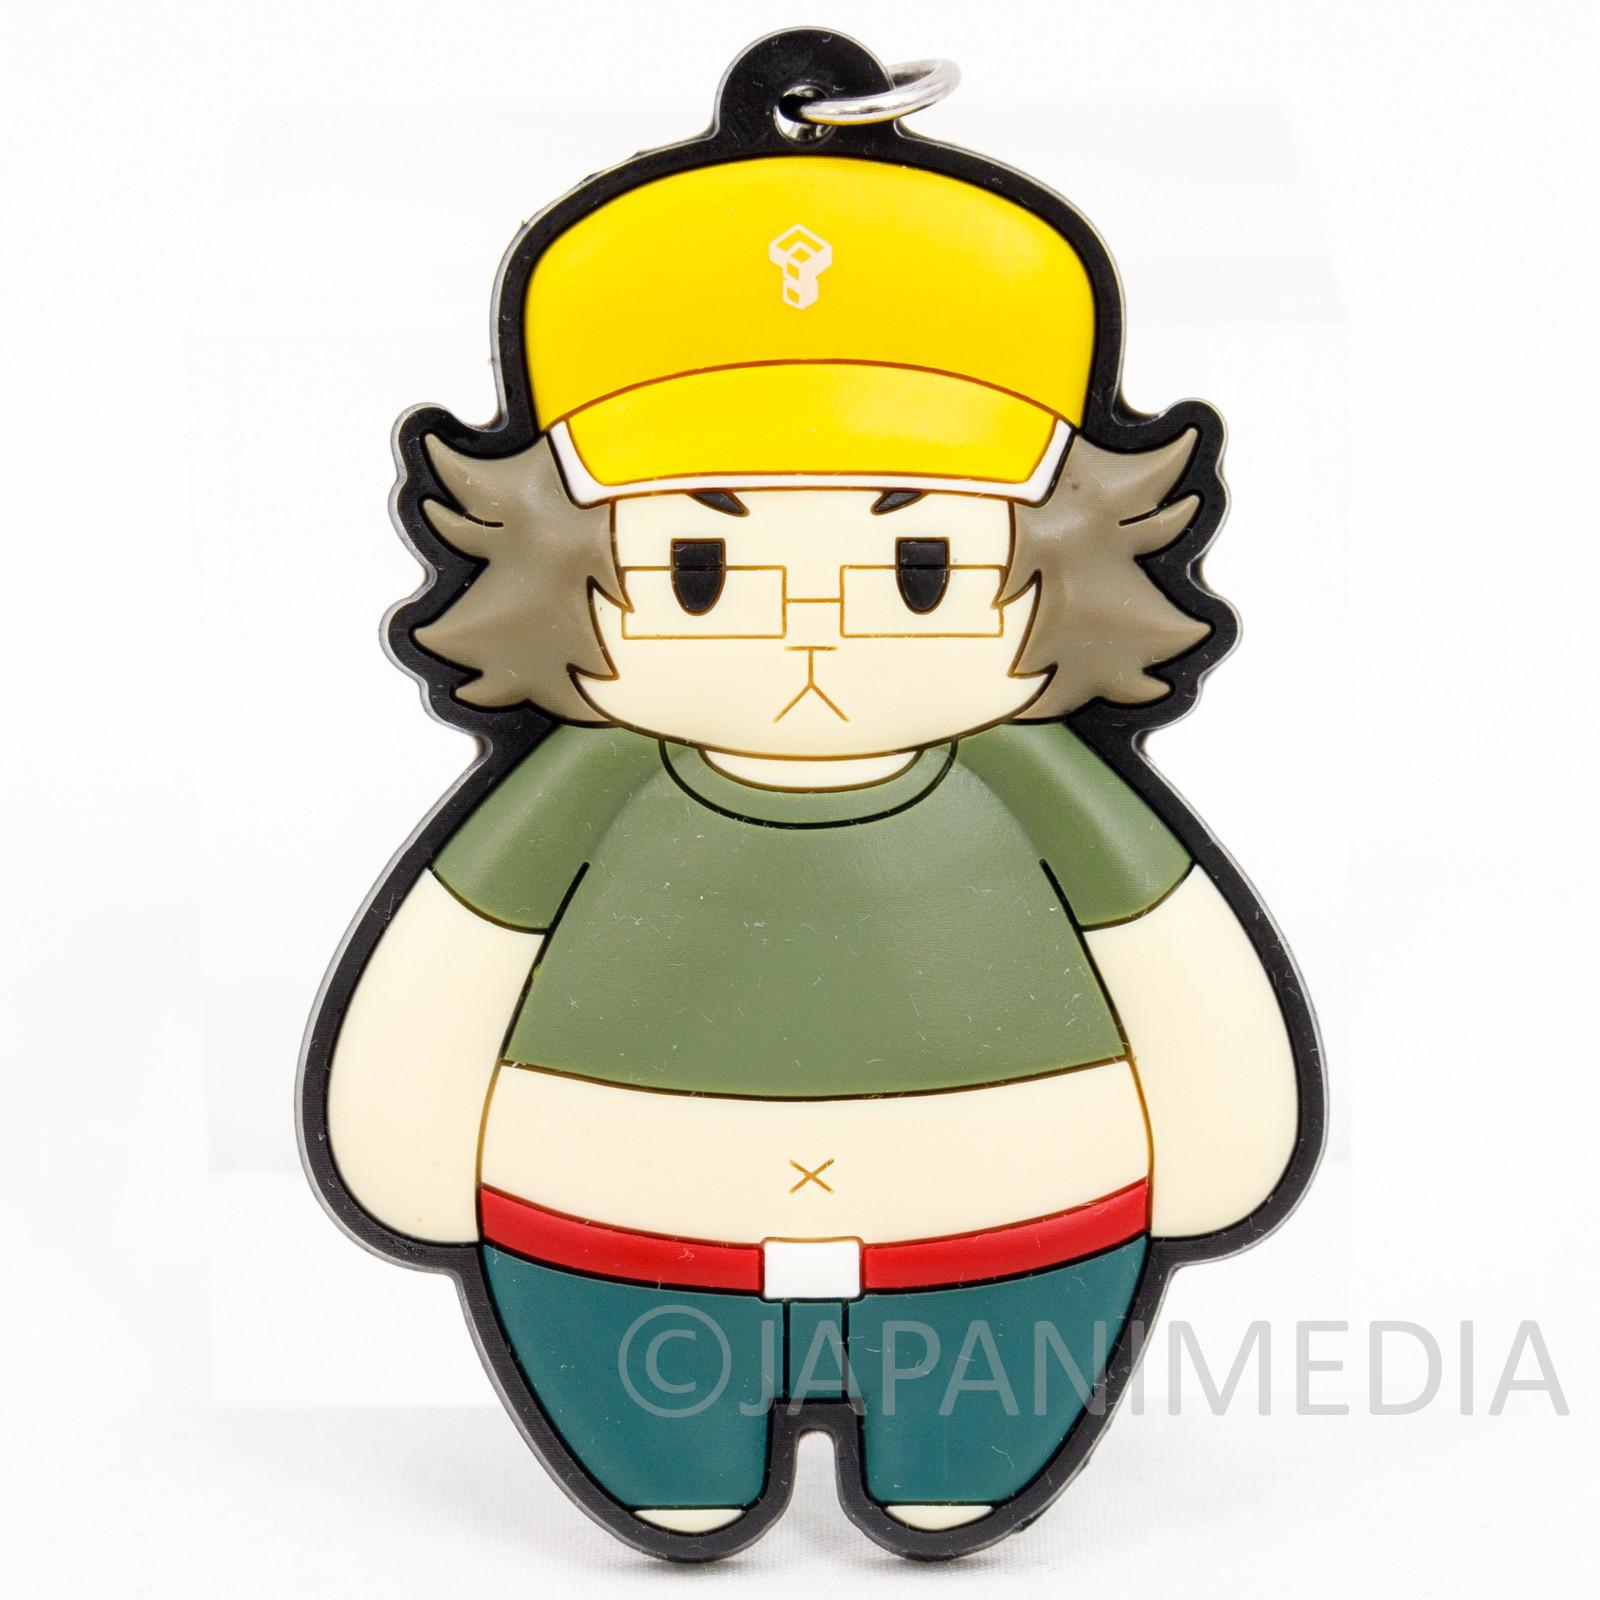 Steins ; Gate Daru Itaru Hashida Mascot Rubber Strap JAPAN ANIME 2